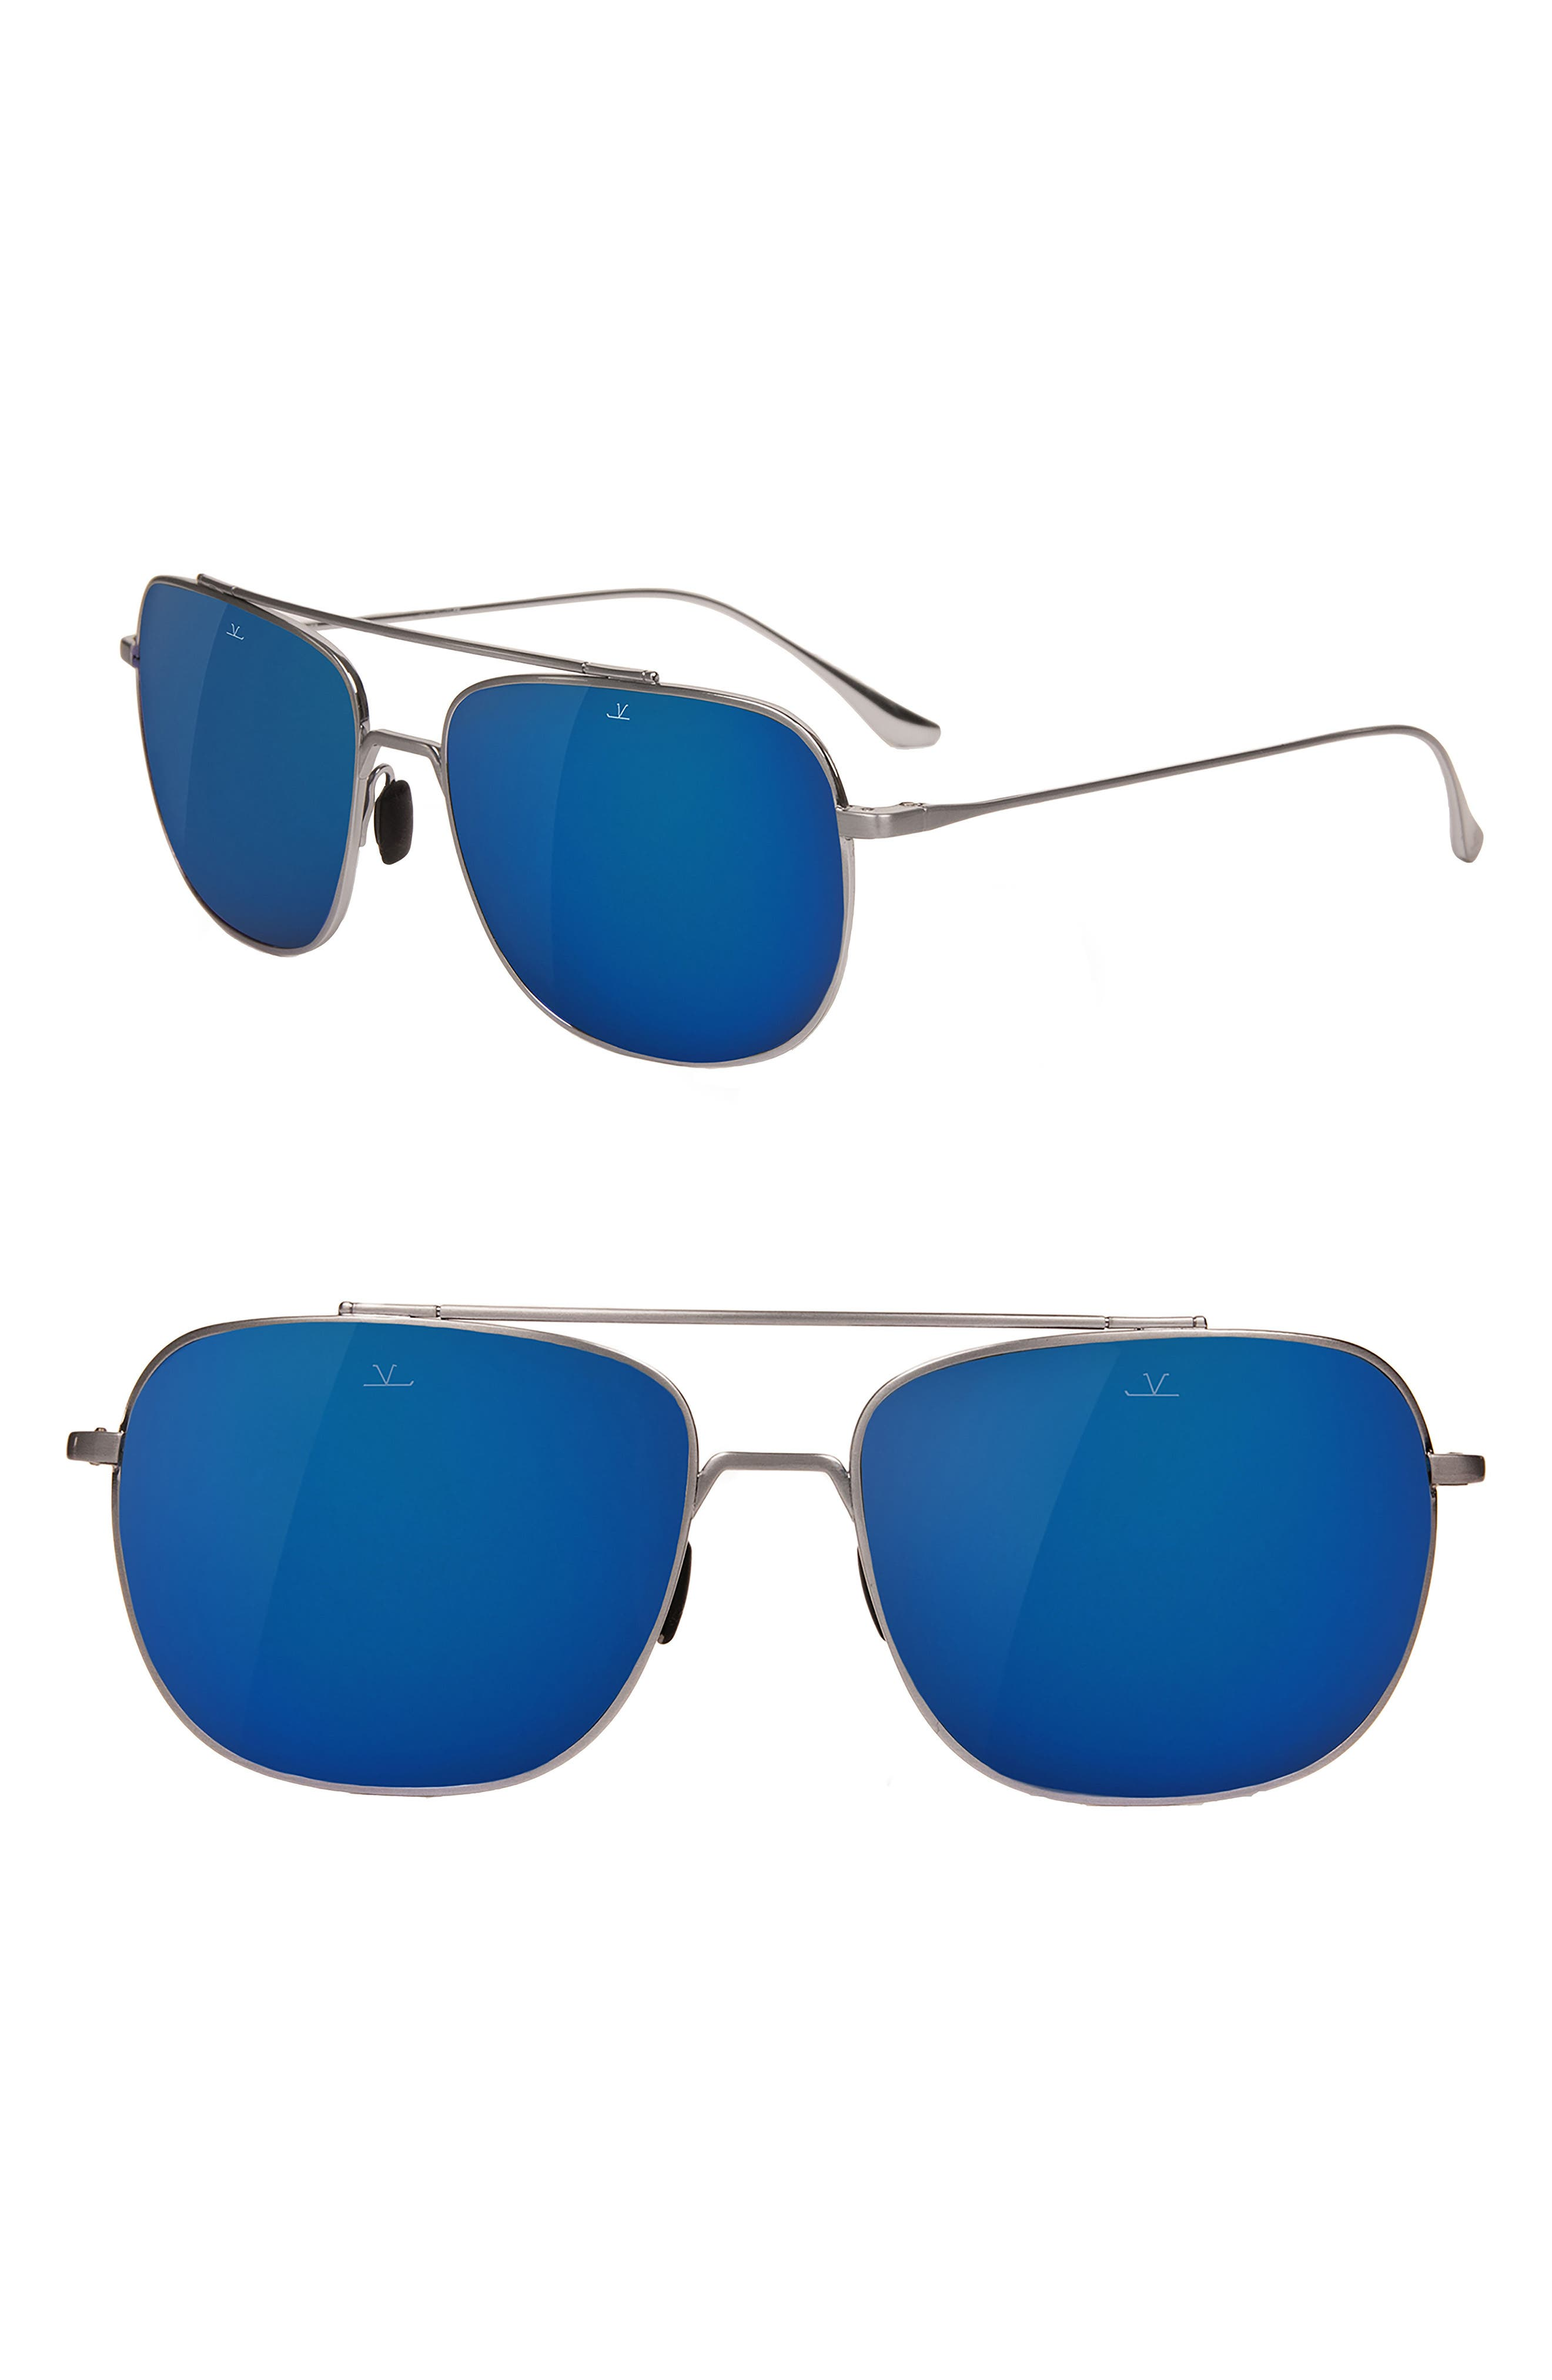 Swing 58mm Navigator Sunglasses,                         Main,                         color, PURE GREY BLUE FLASH